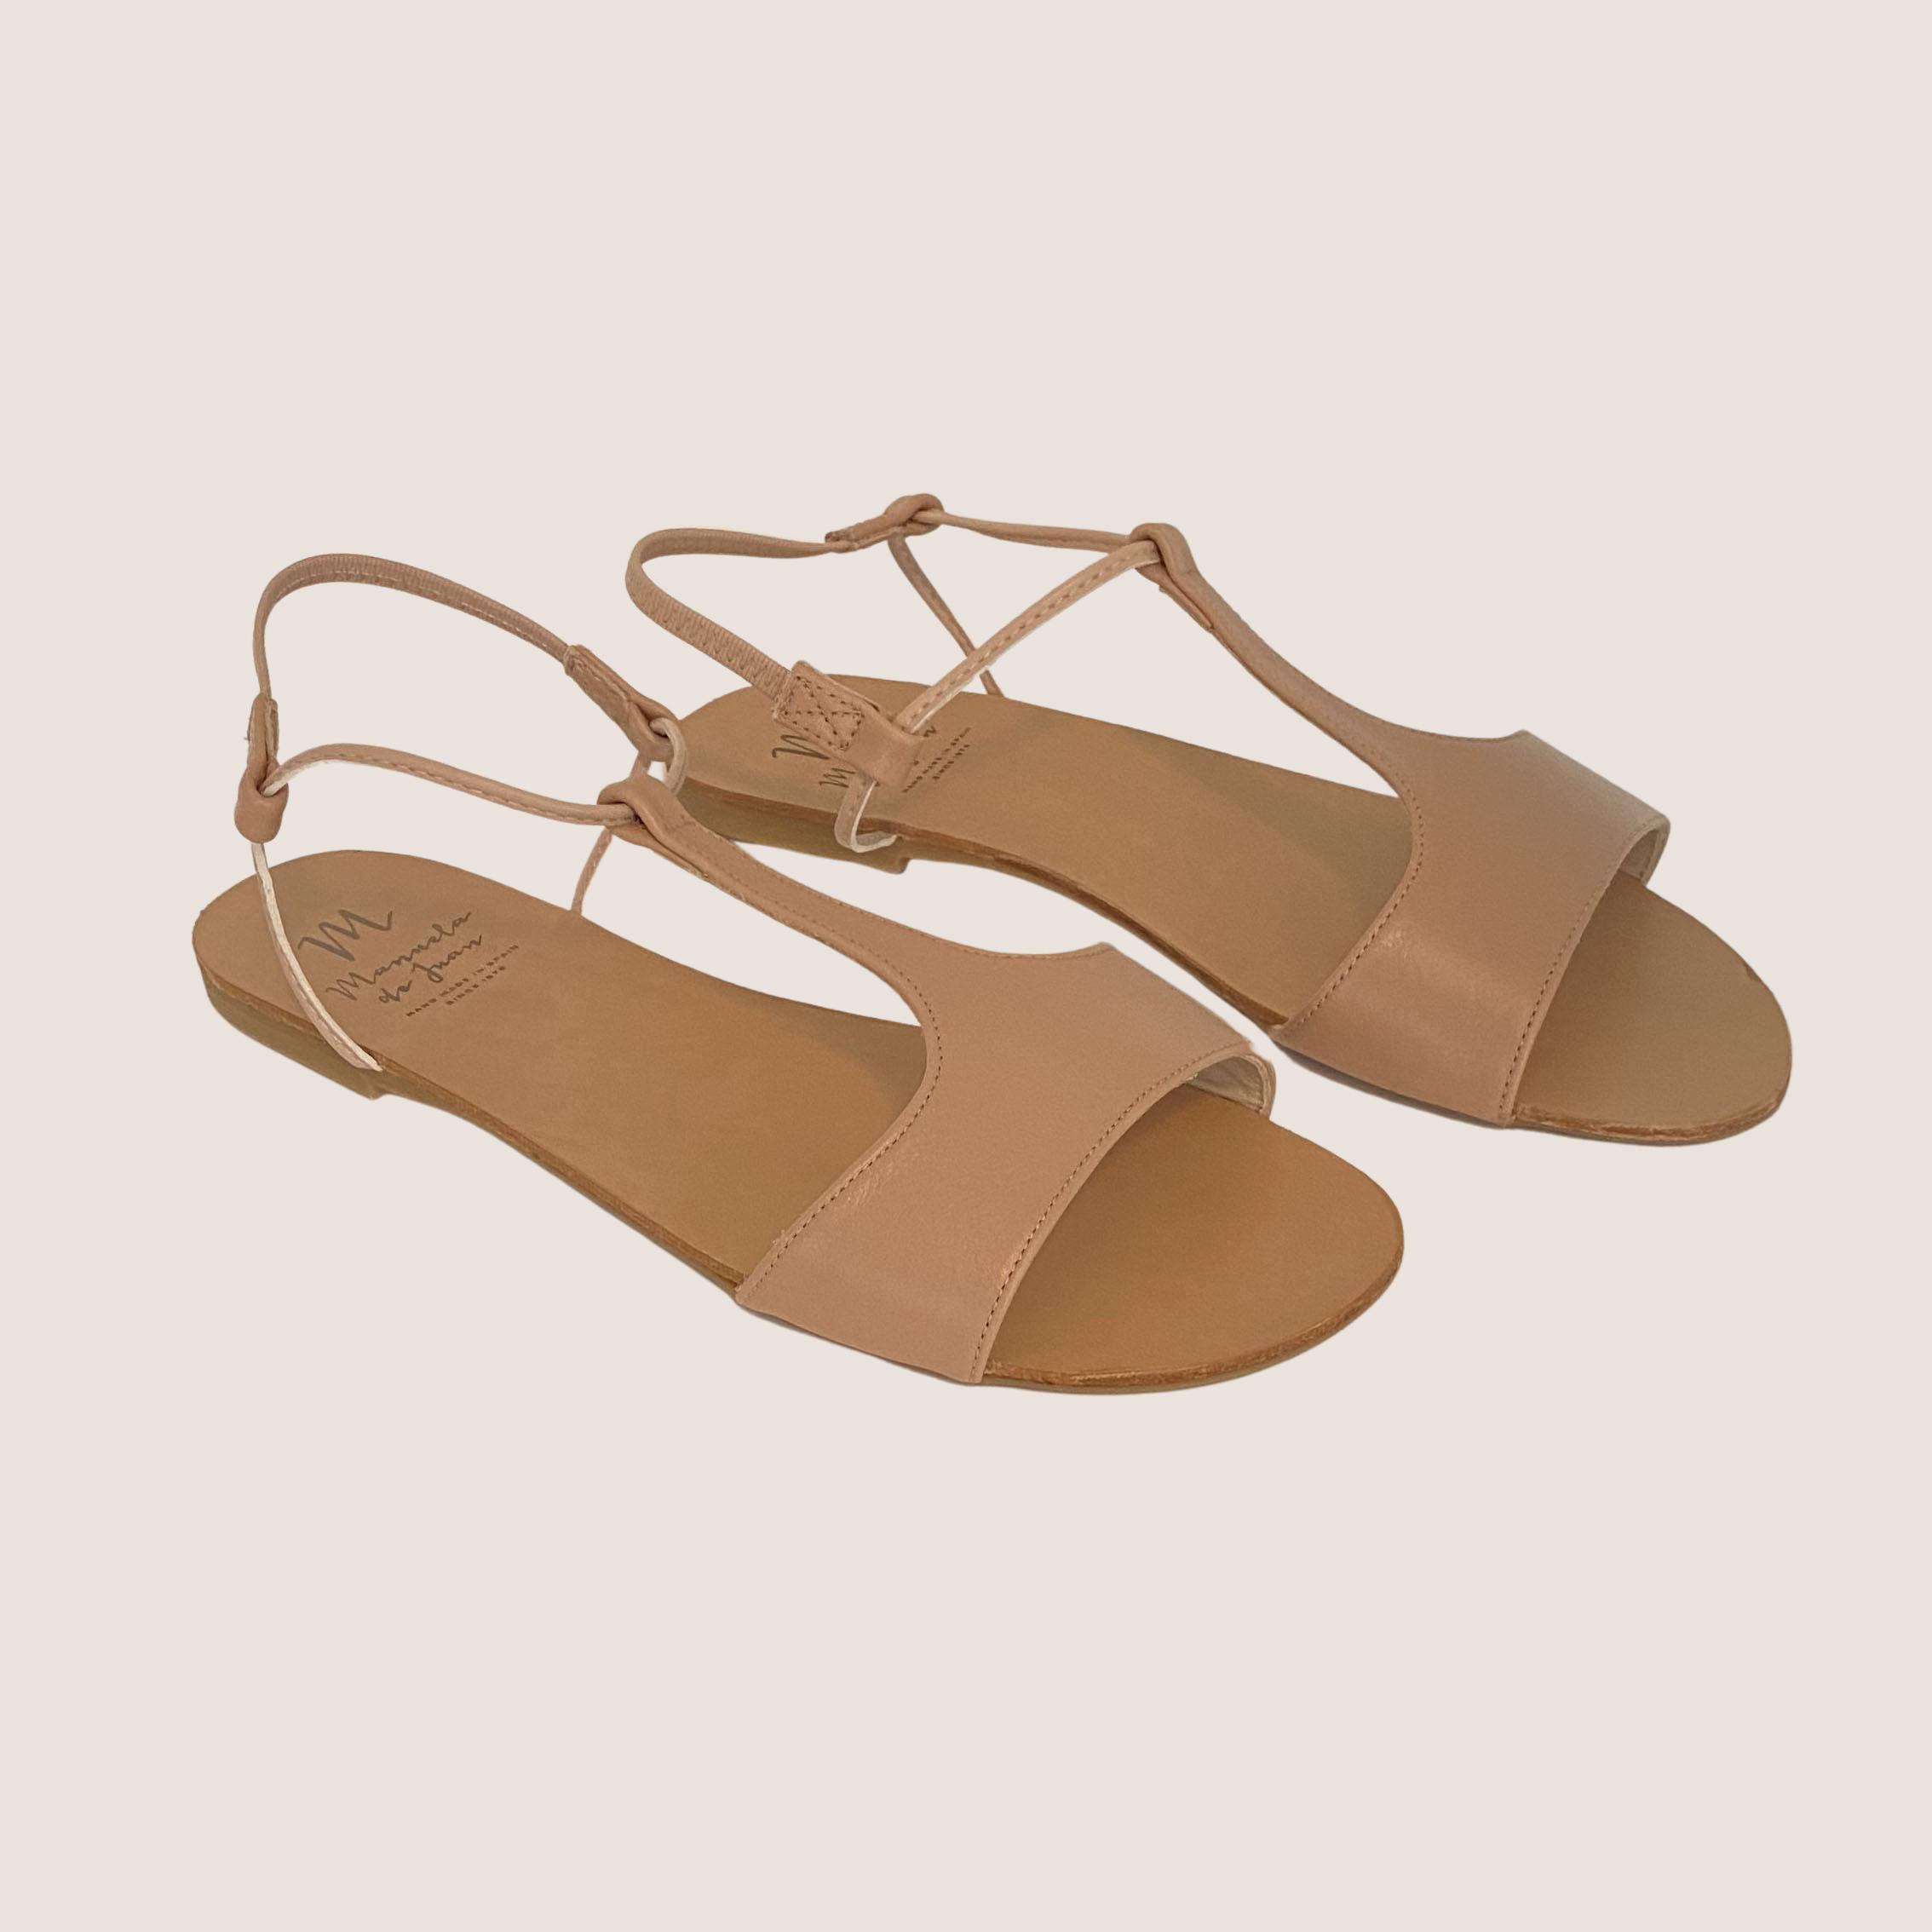 Mikonos Sandal - Leather